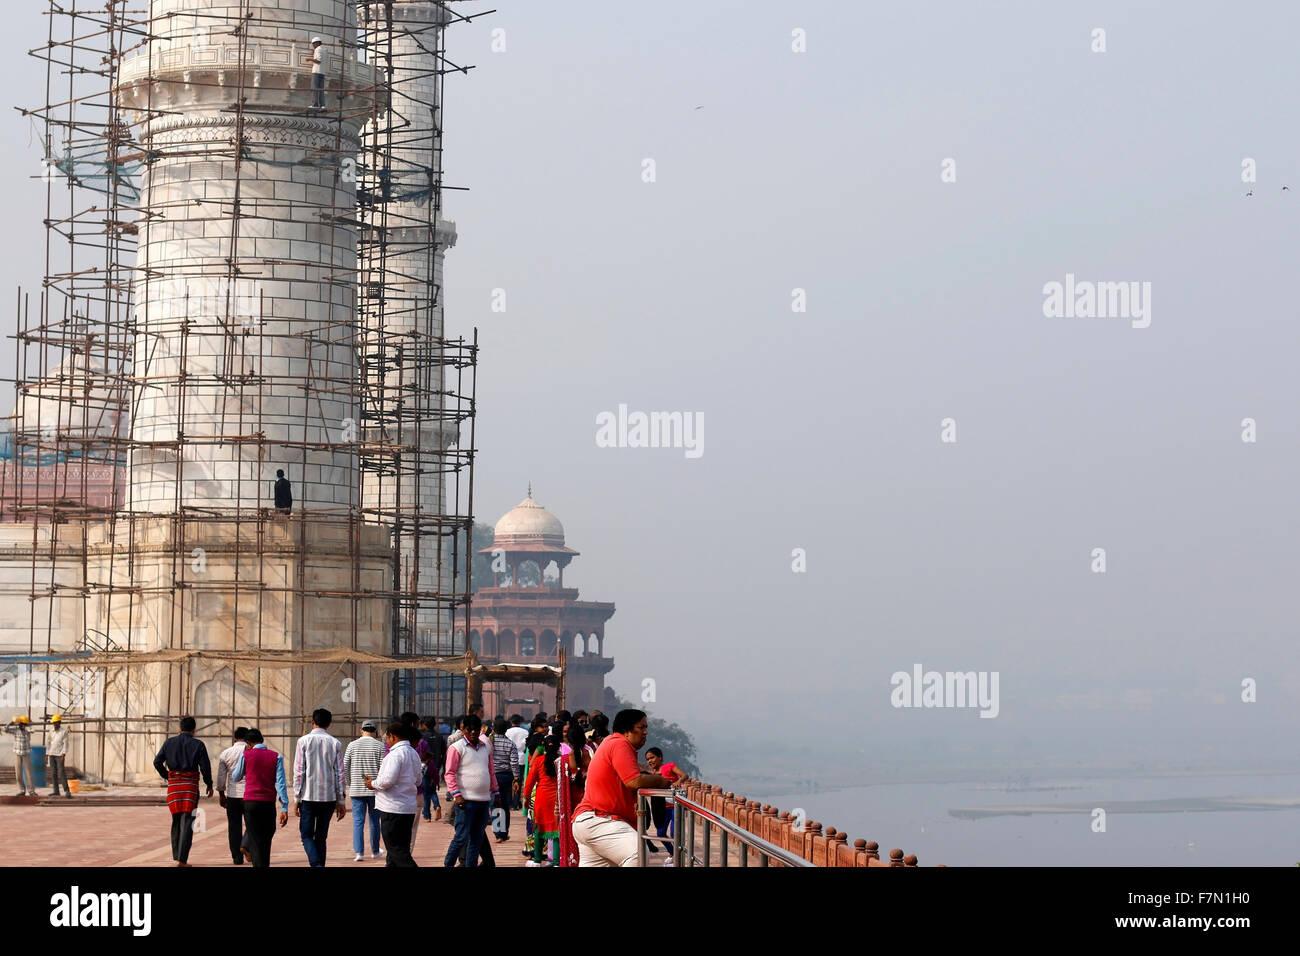 Construction work at Taj Stock Photo